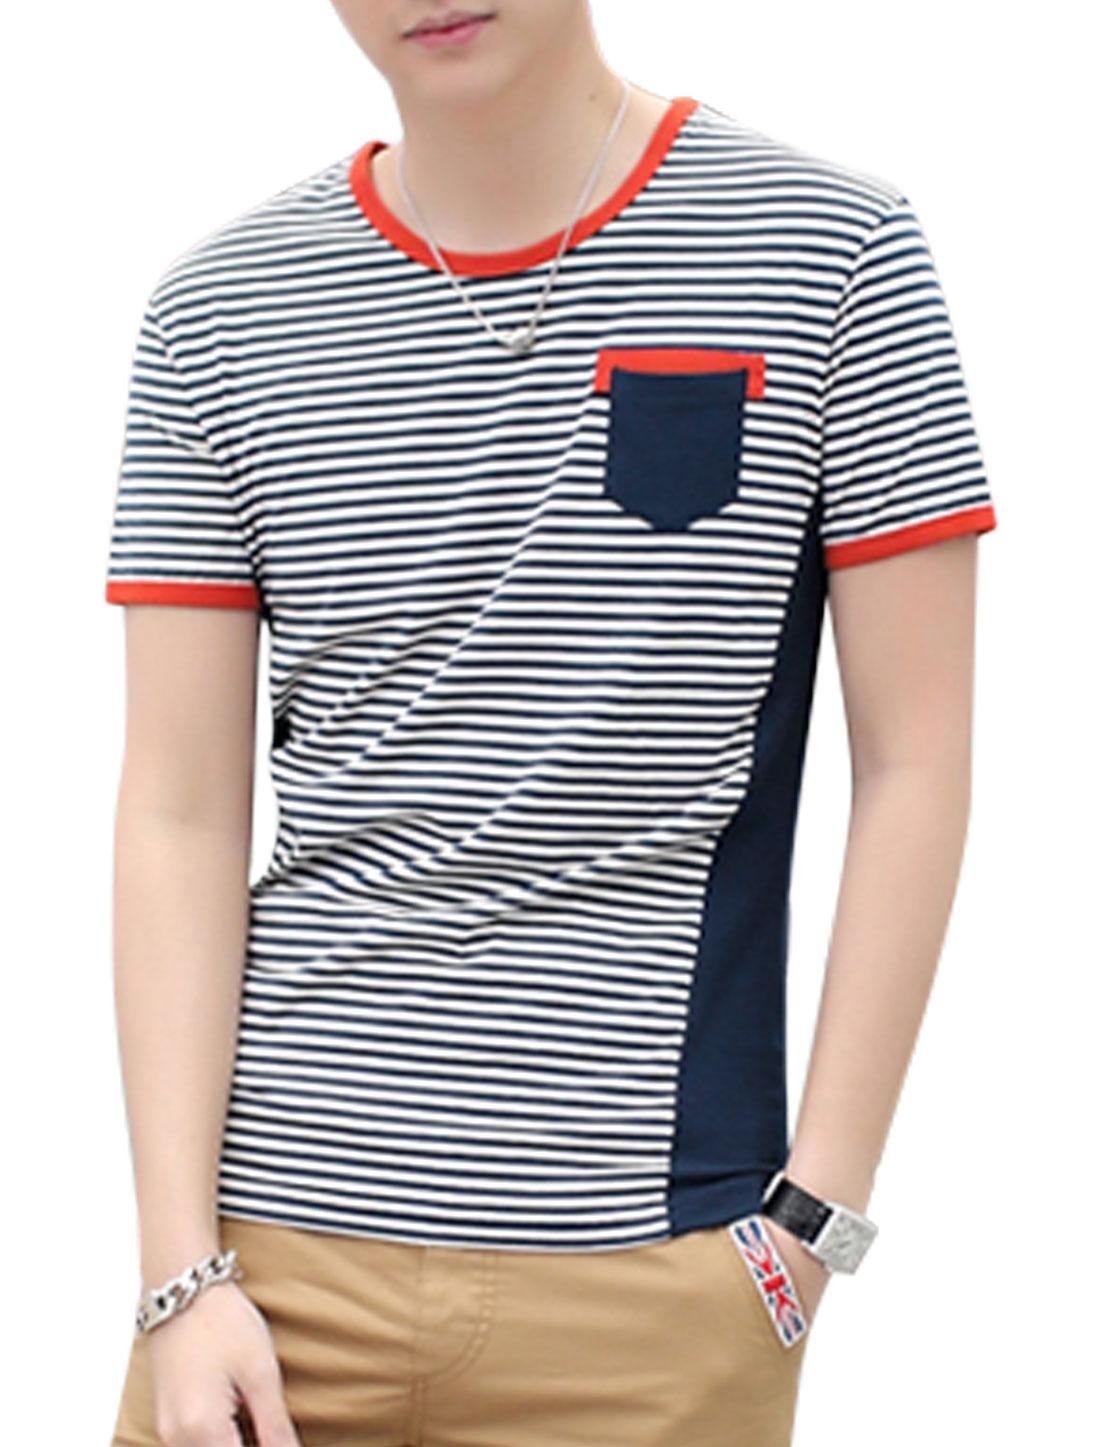 Man Stripes Round Neck One Chest Pocket Casual Tee Navy Blue Beige M